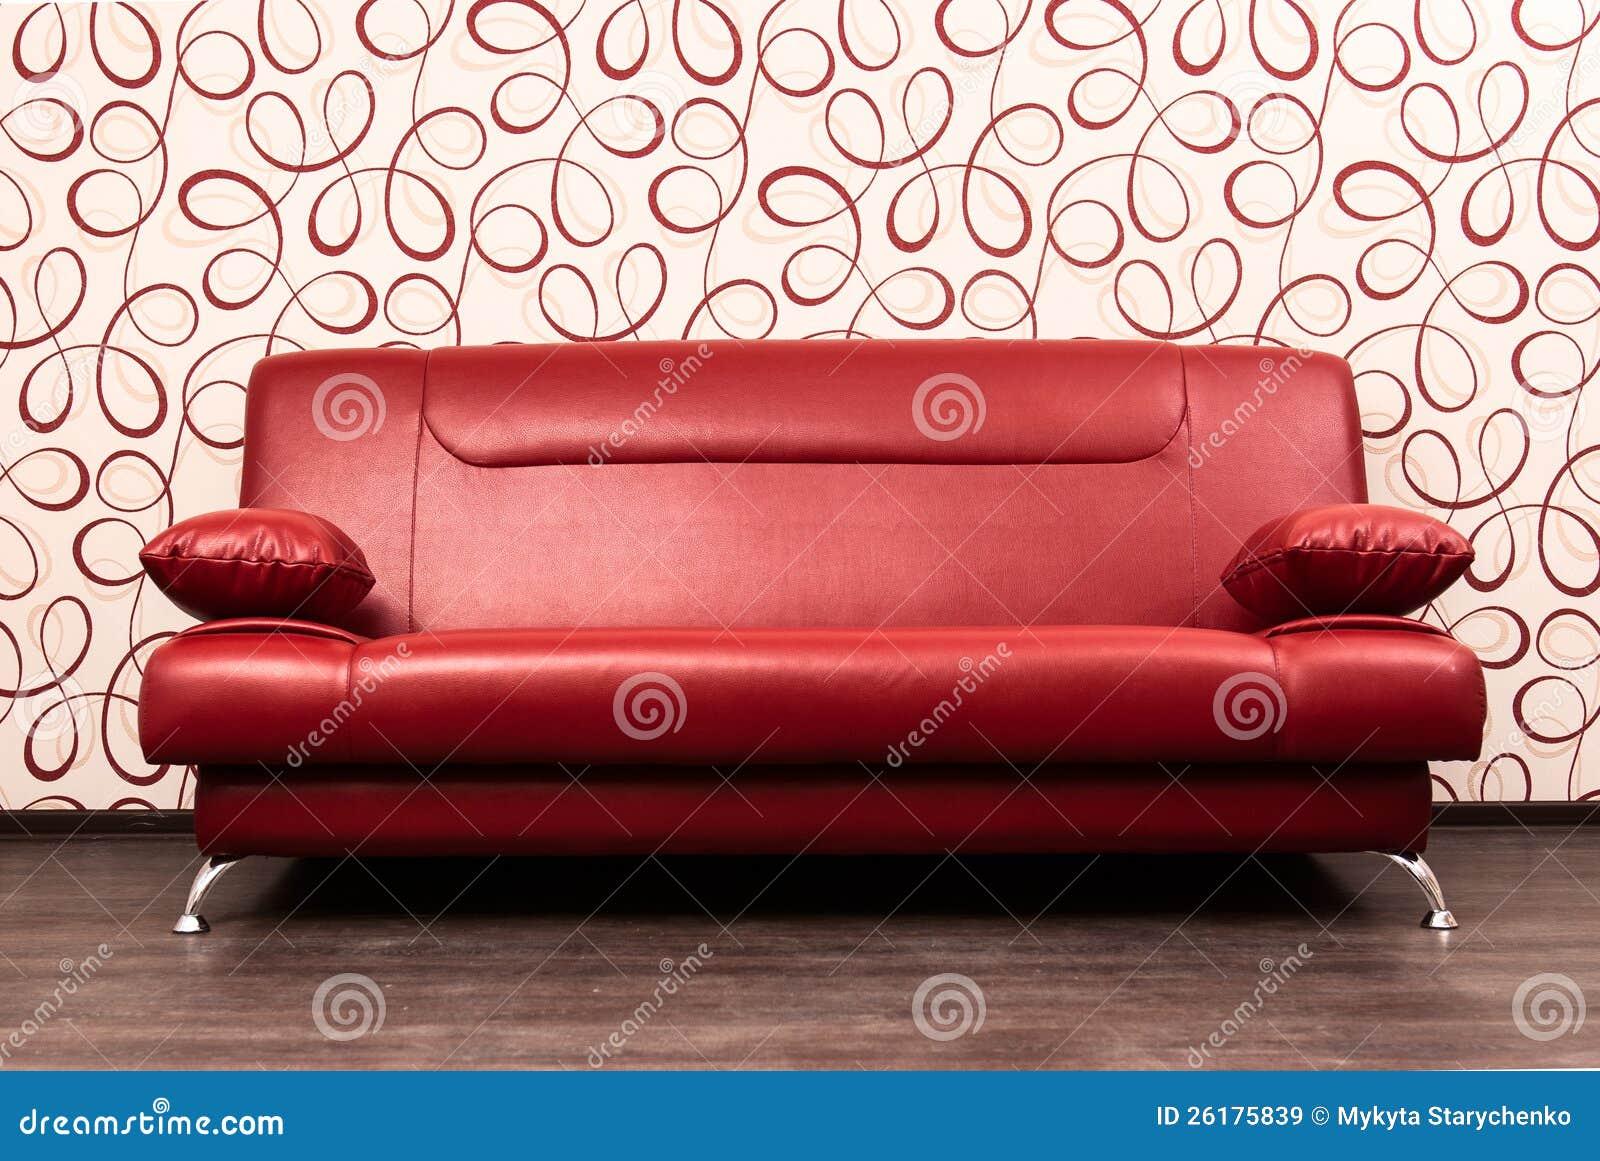 modernes rotes sofa vor der wand lizenzfreie stockbilder bild 26175839. Black Bedroom Furniture Sets. Home Design Ideas